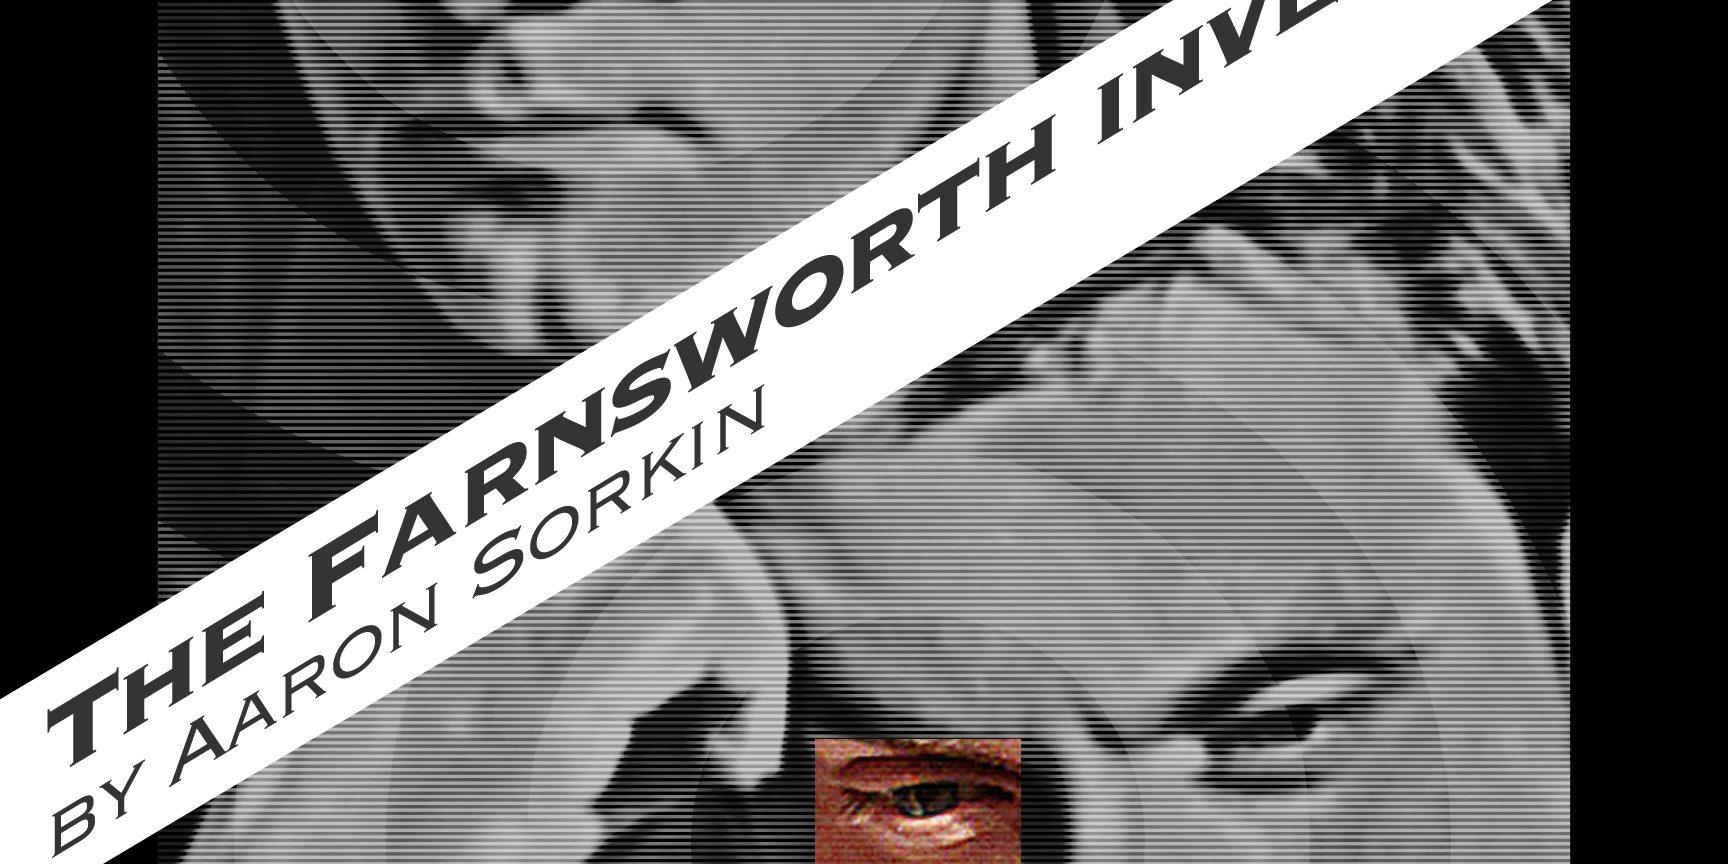 The-Farnsworth-Invention-poster---24x36-_04